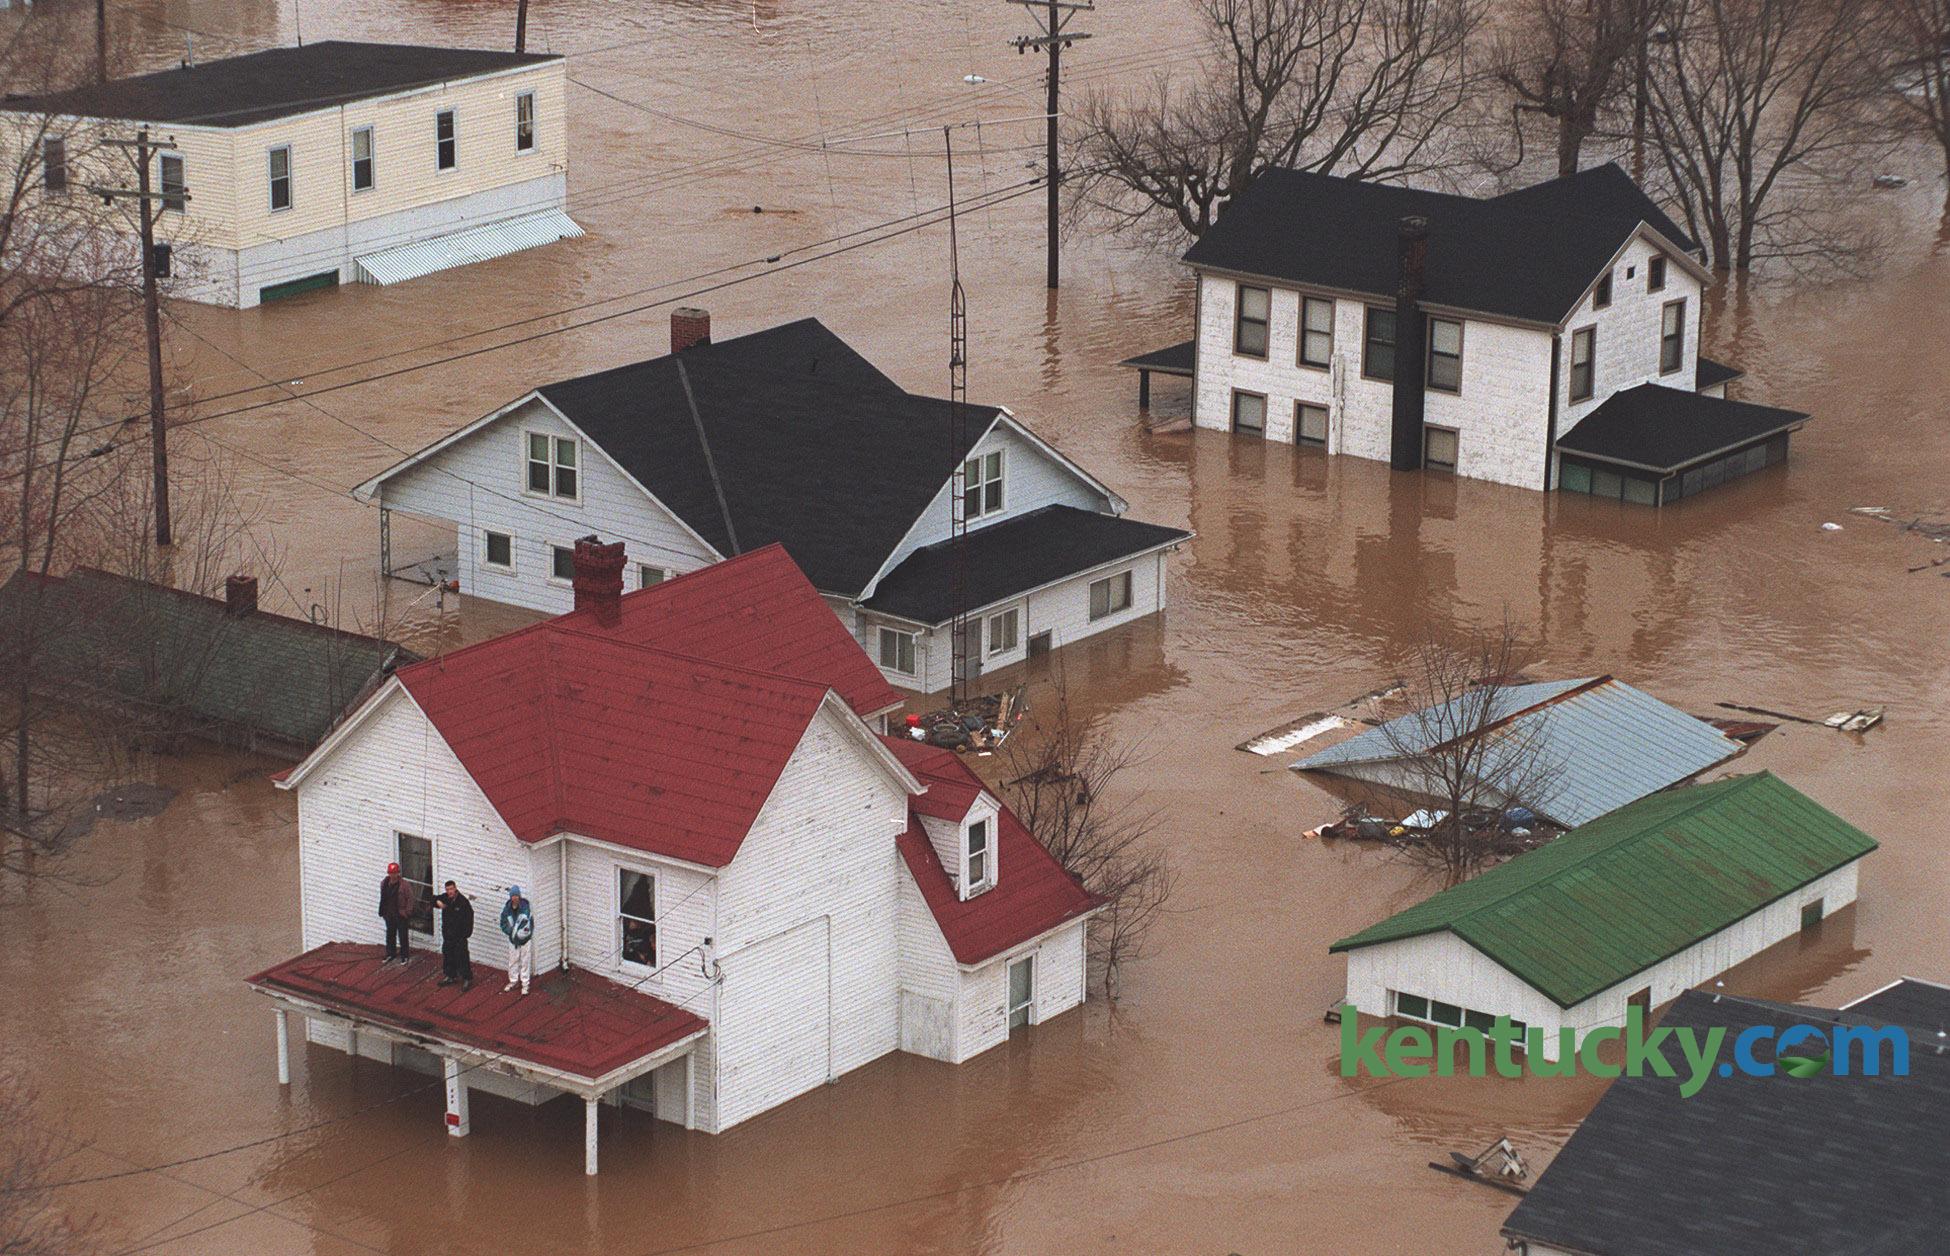 Cynthiana Flooding 1997 Kentucky Photo Archive